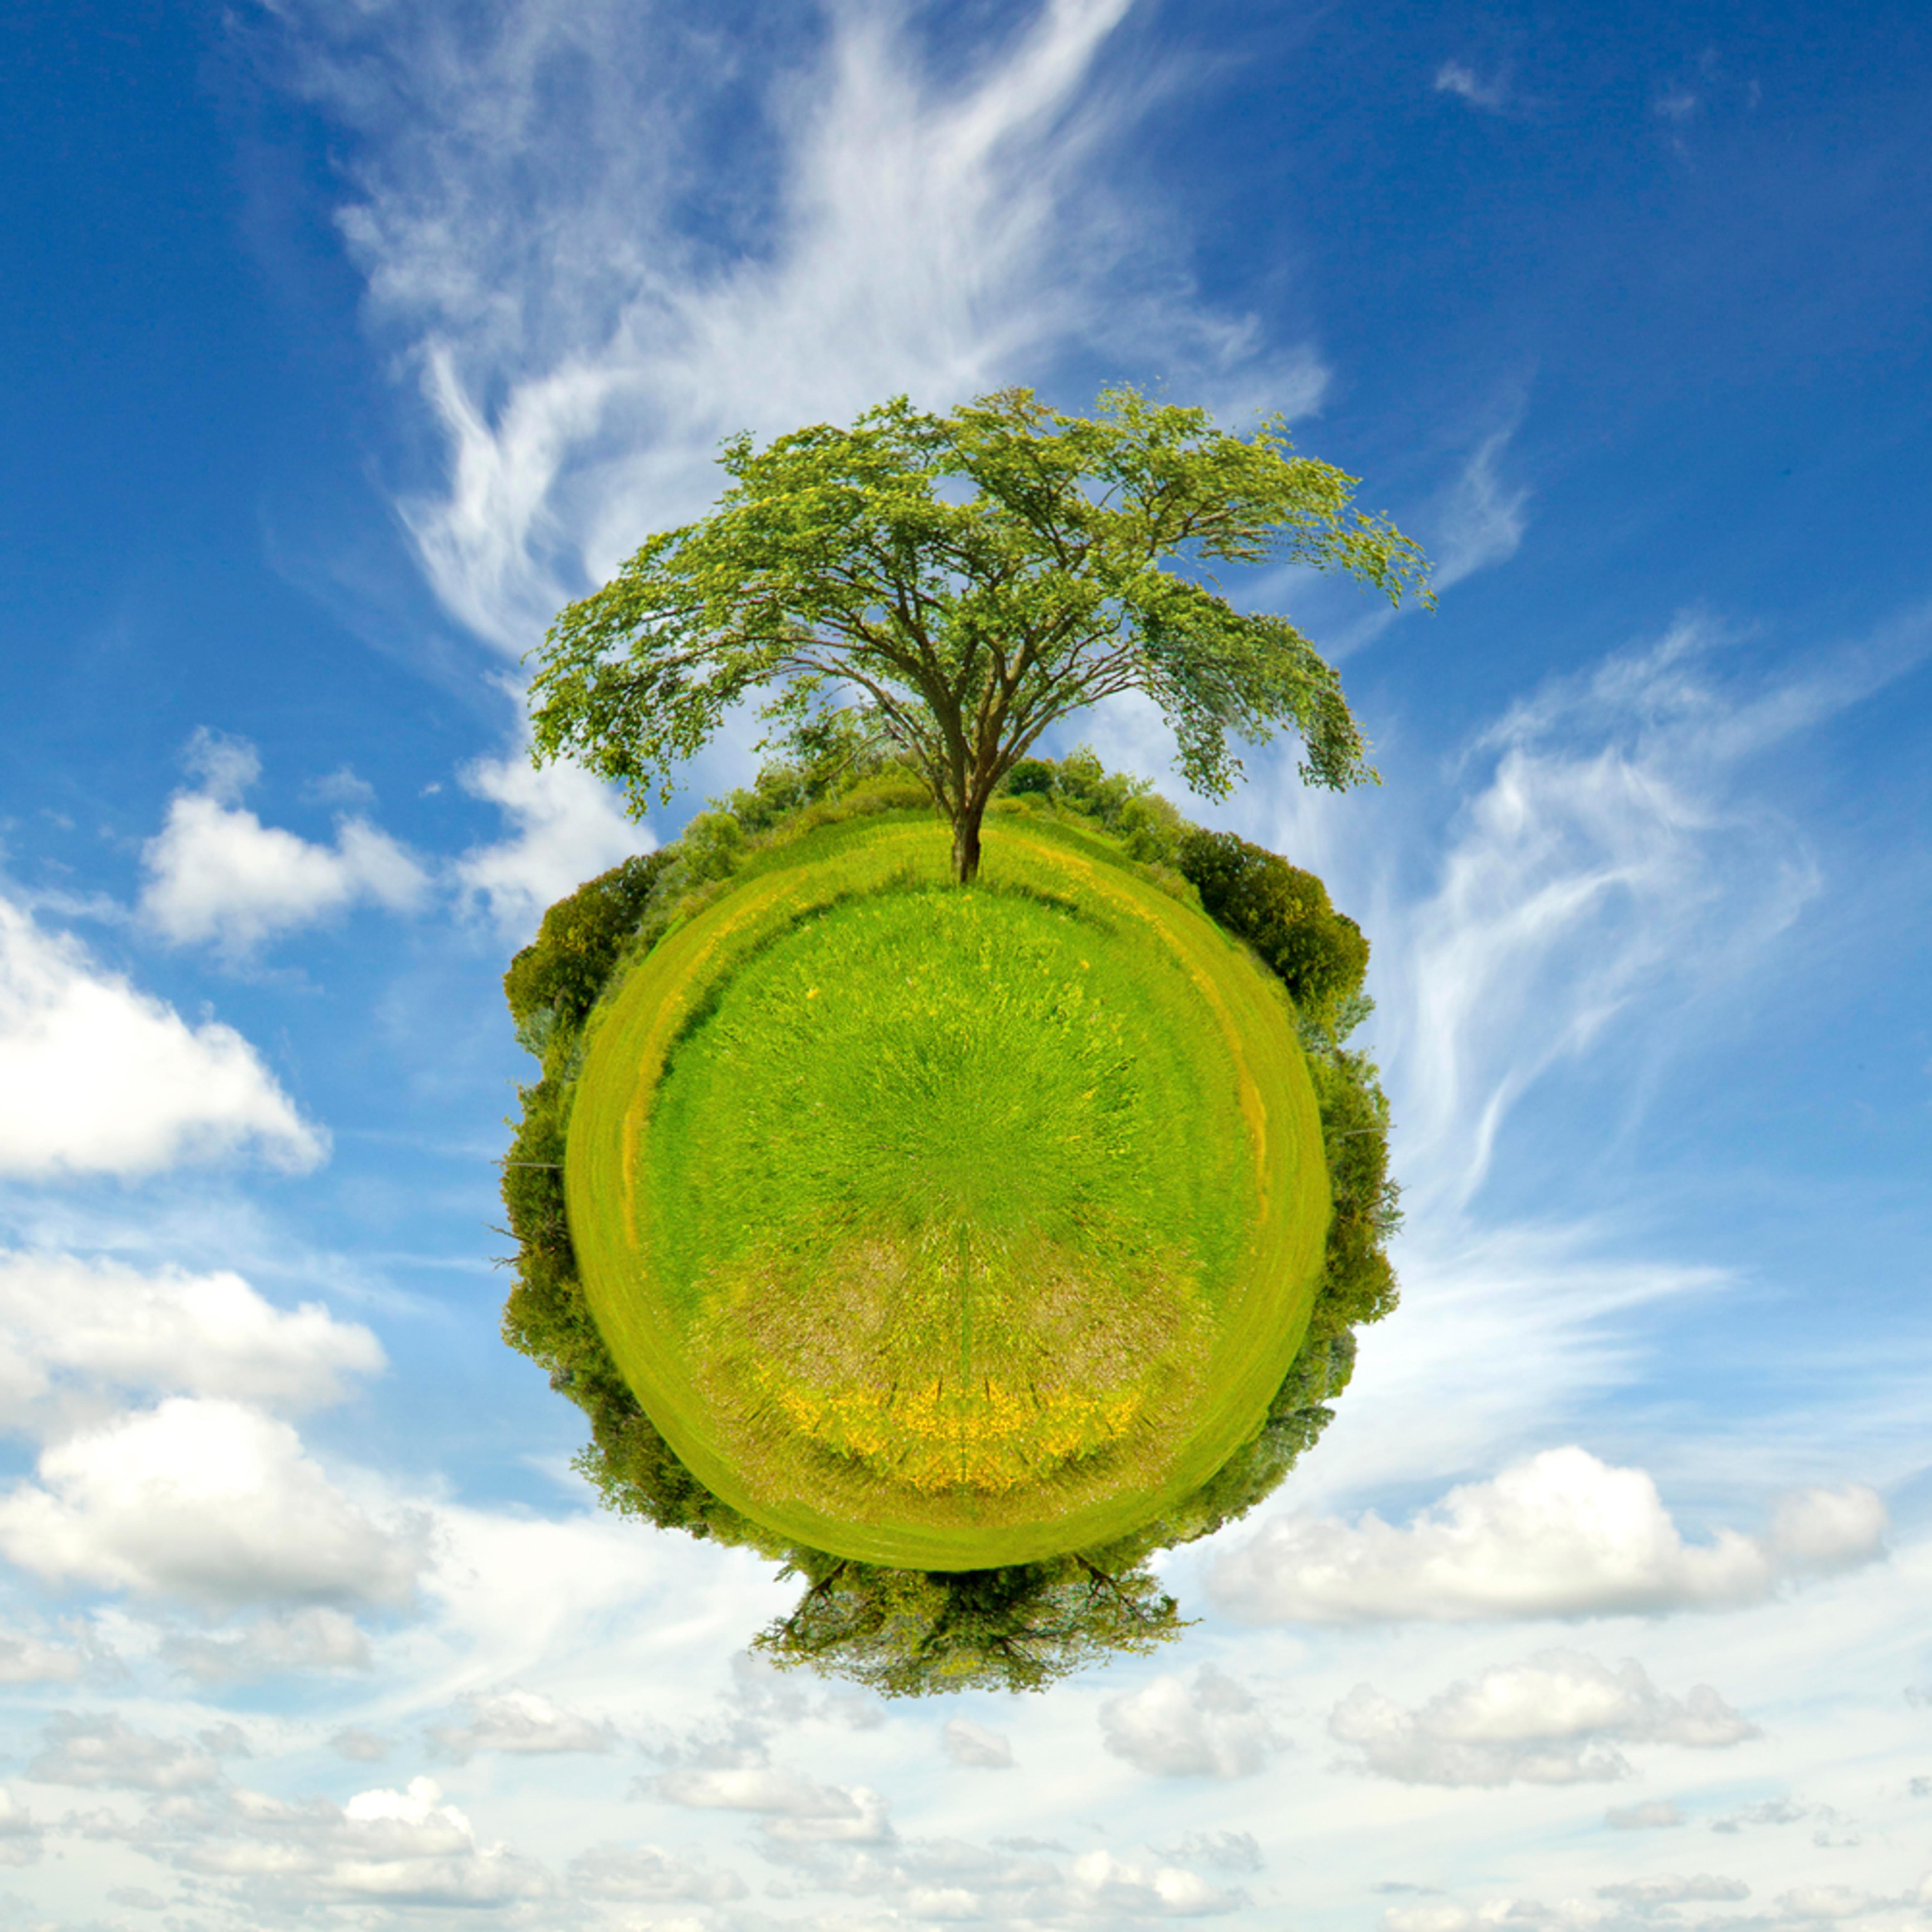 Treeplanet asf  vioktr